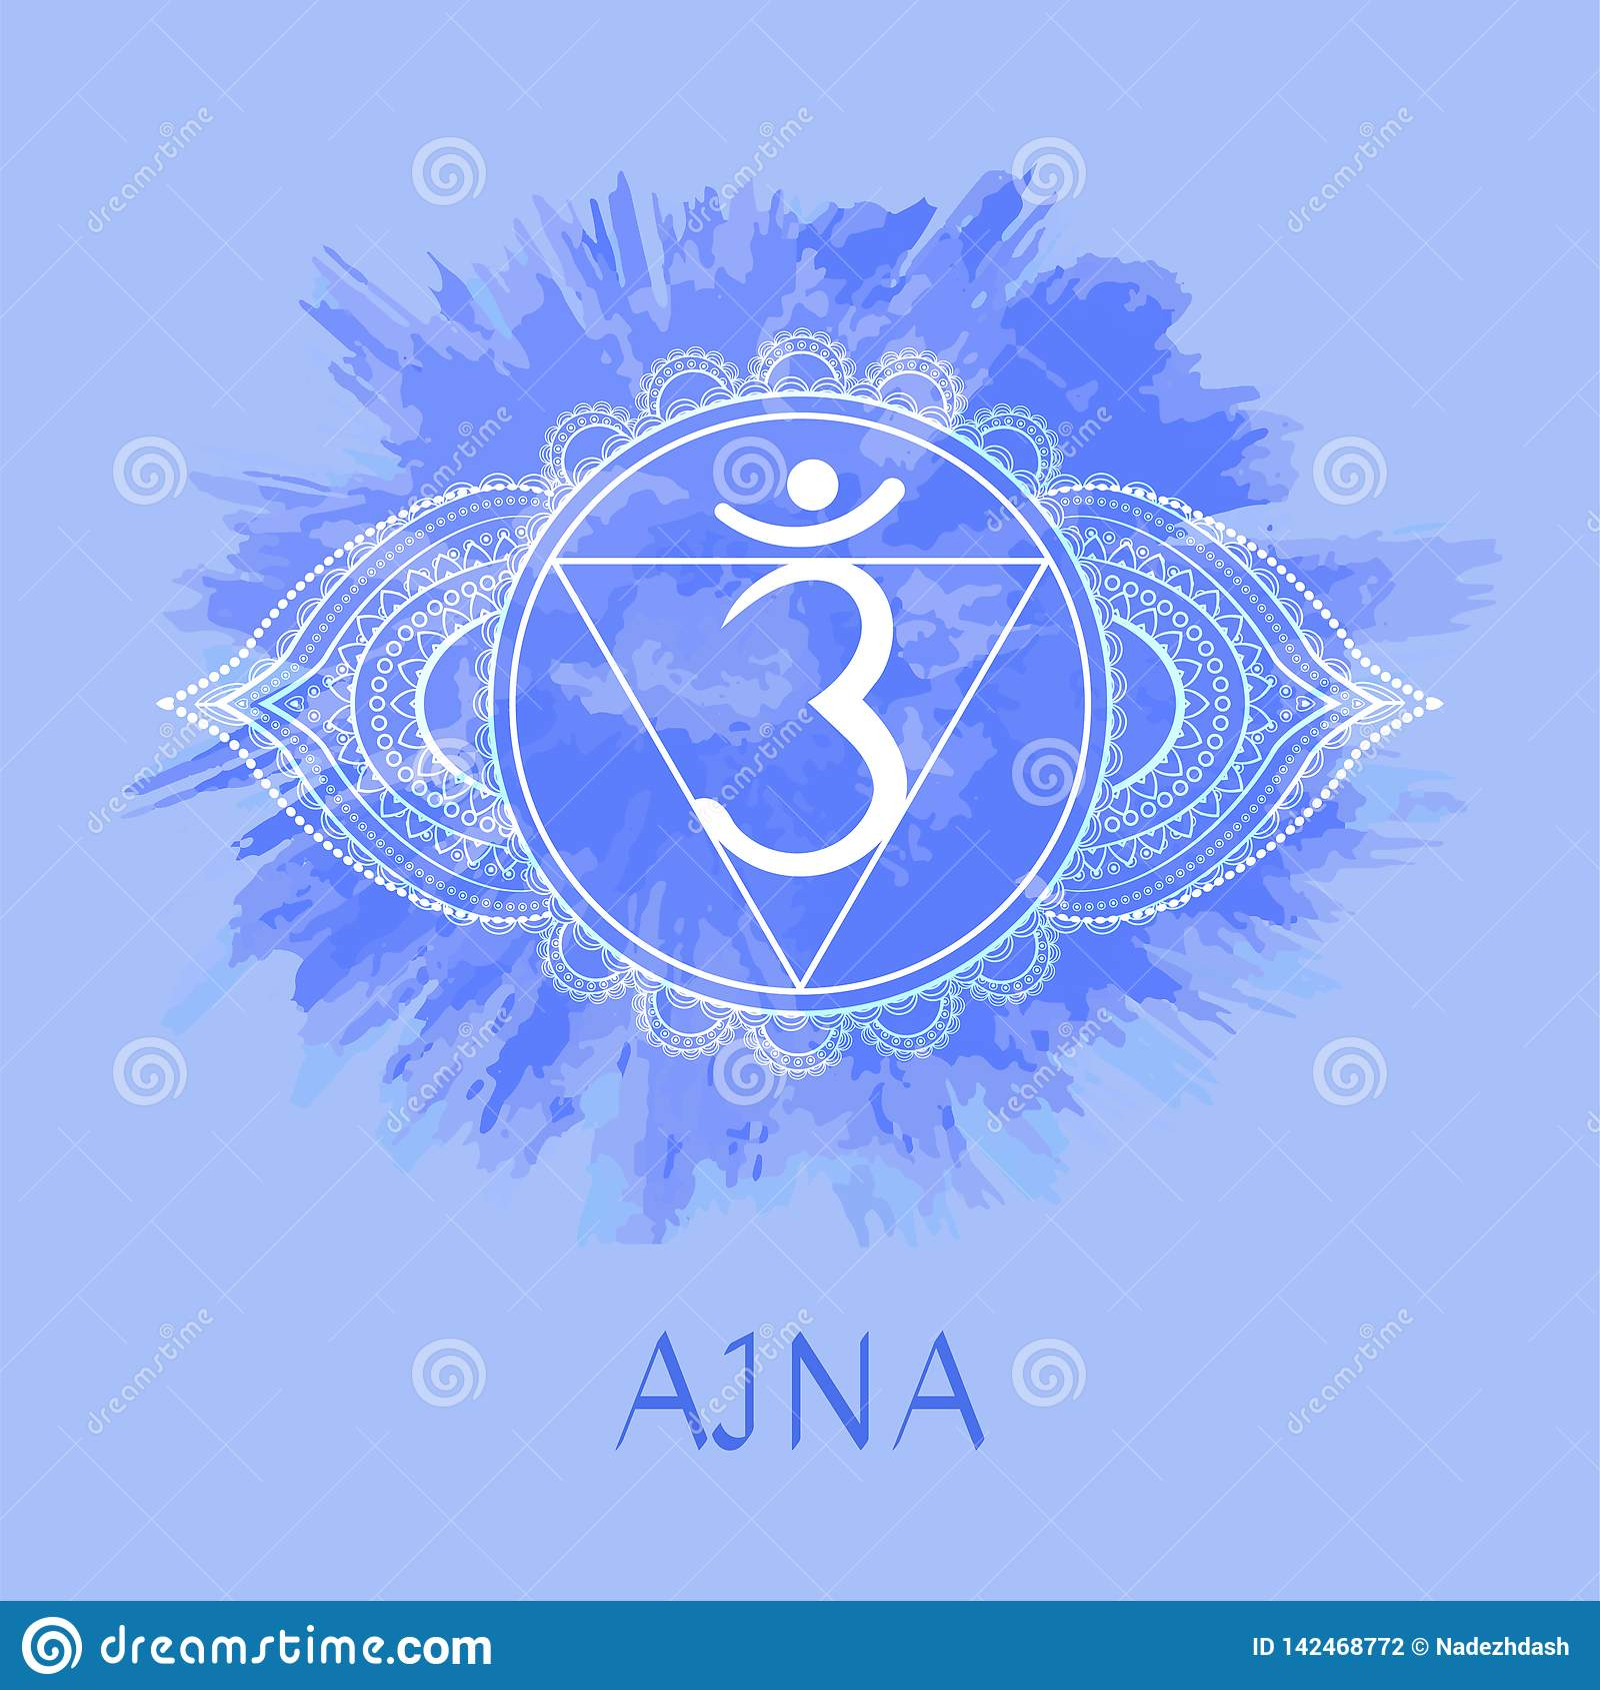 Vektorillustration mit Symbol chakra Ajna auf Aquarellhintergrund